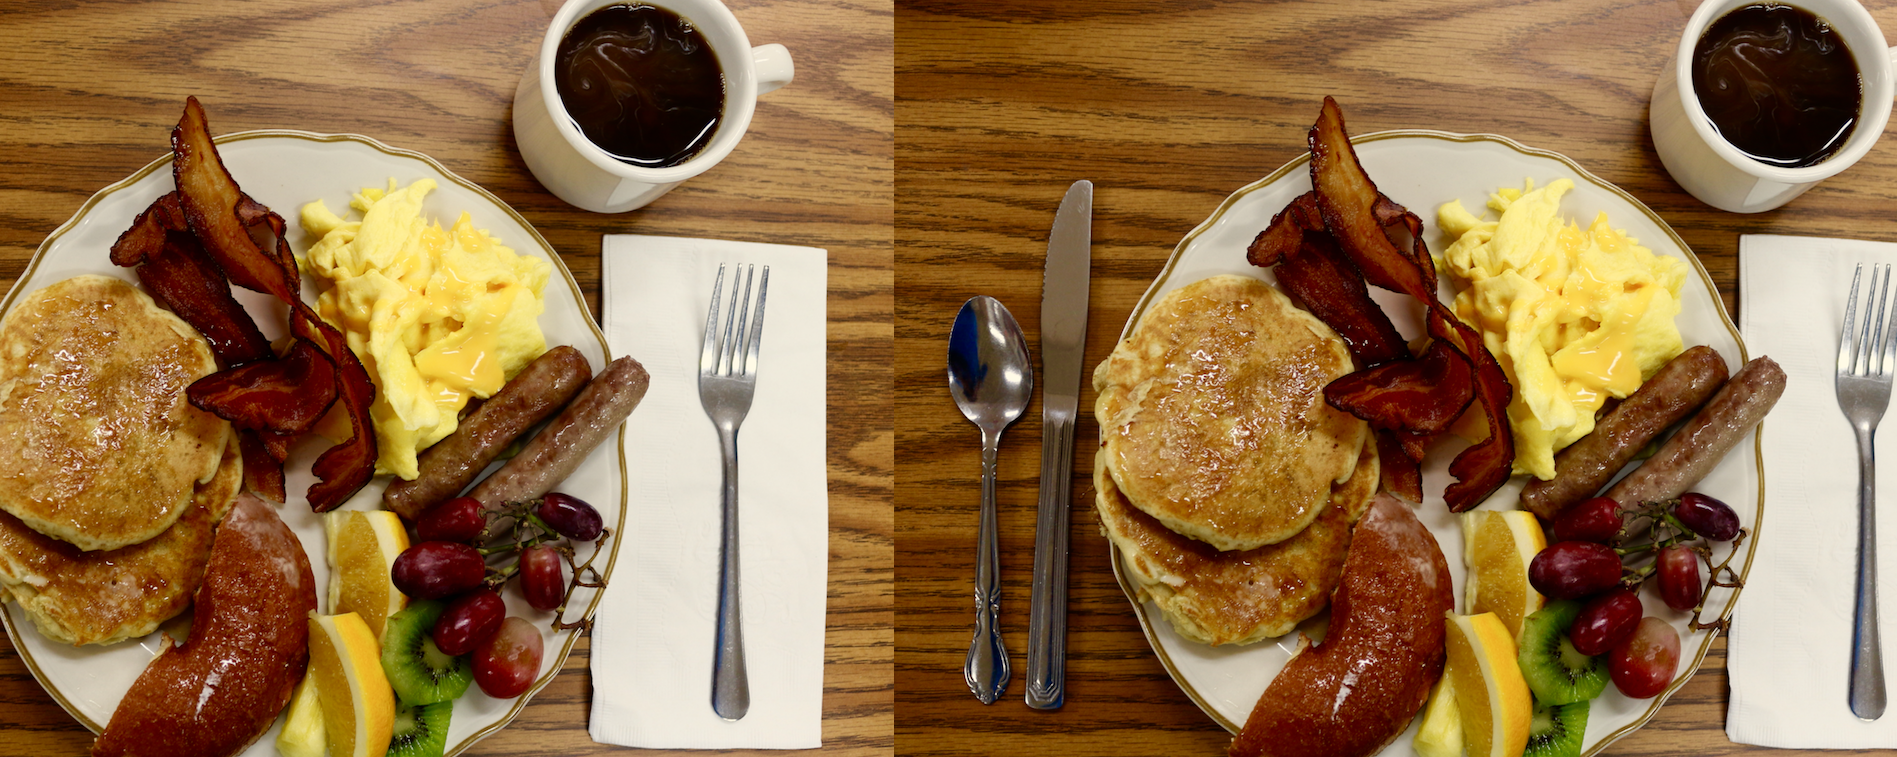 Breakfast Buffet at Kinzers Fire Hall